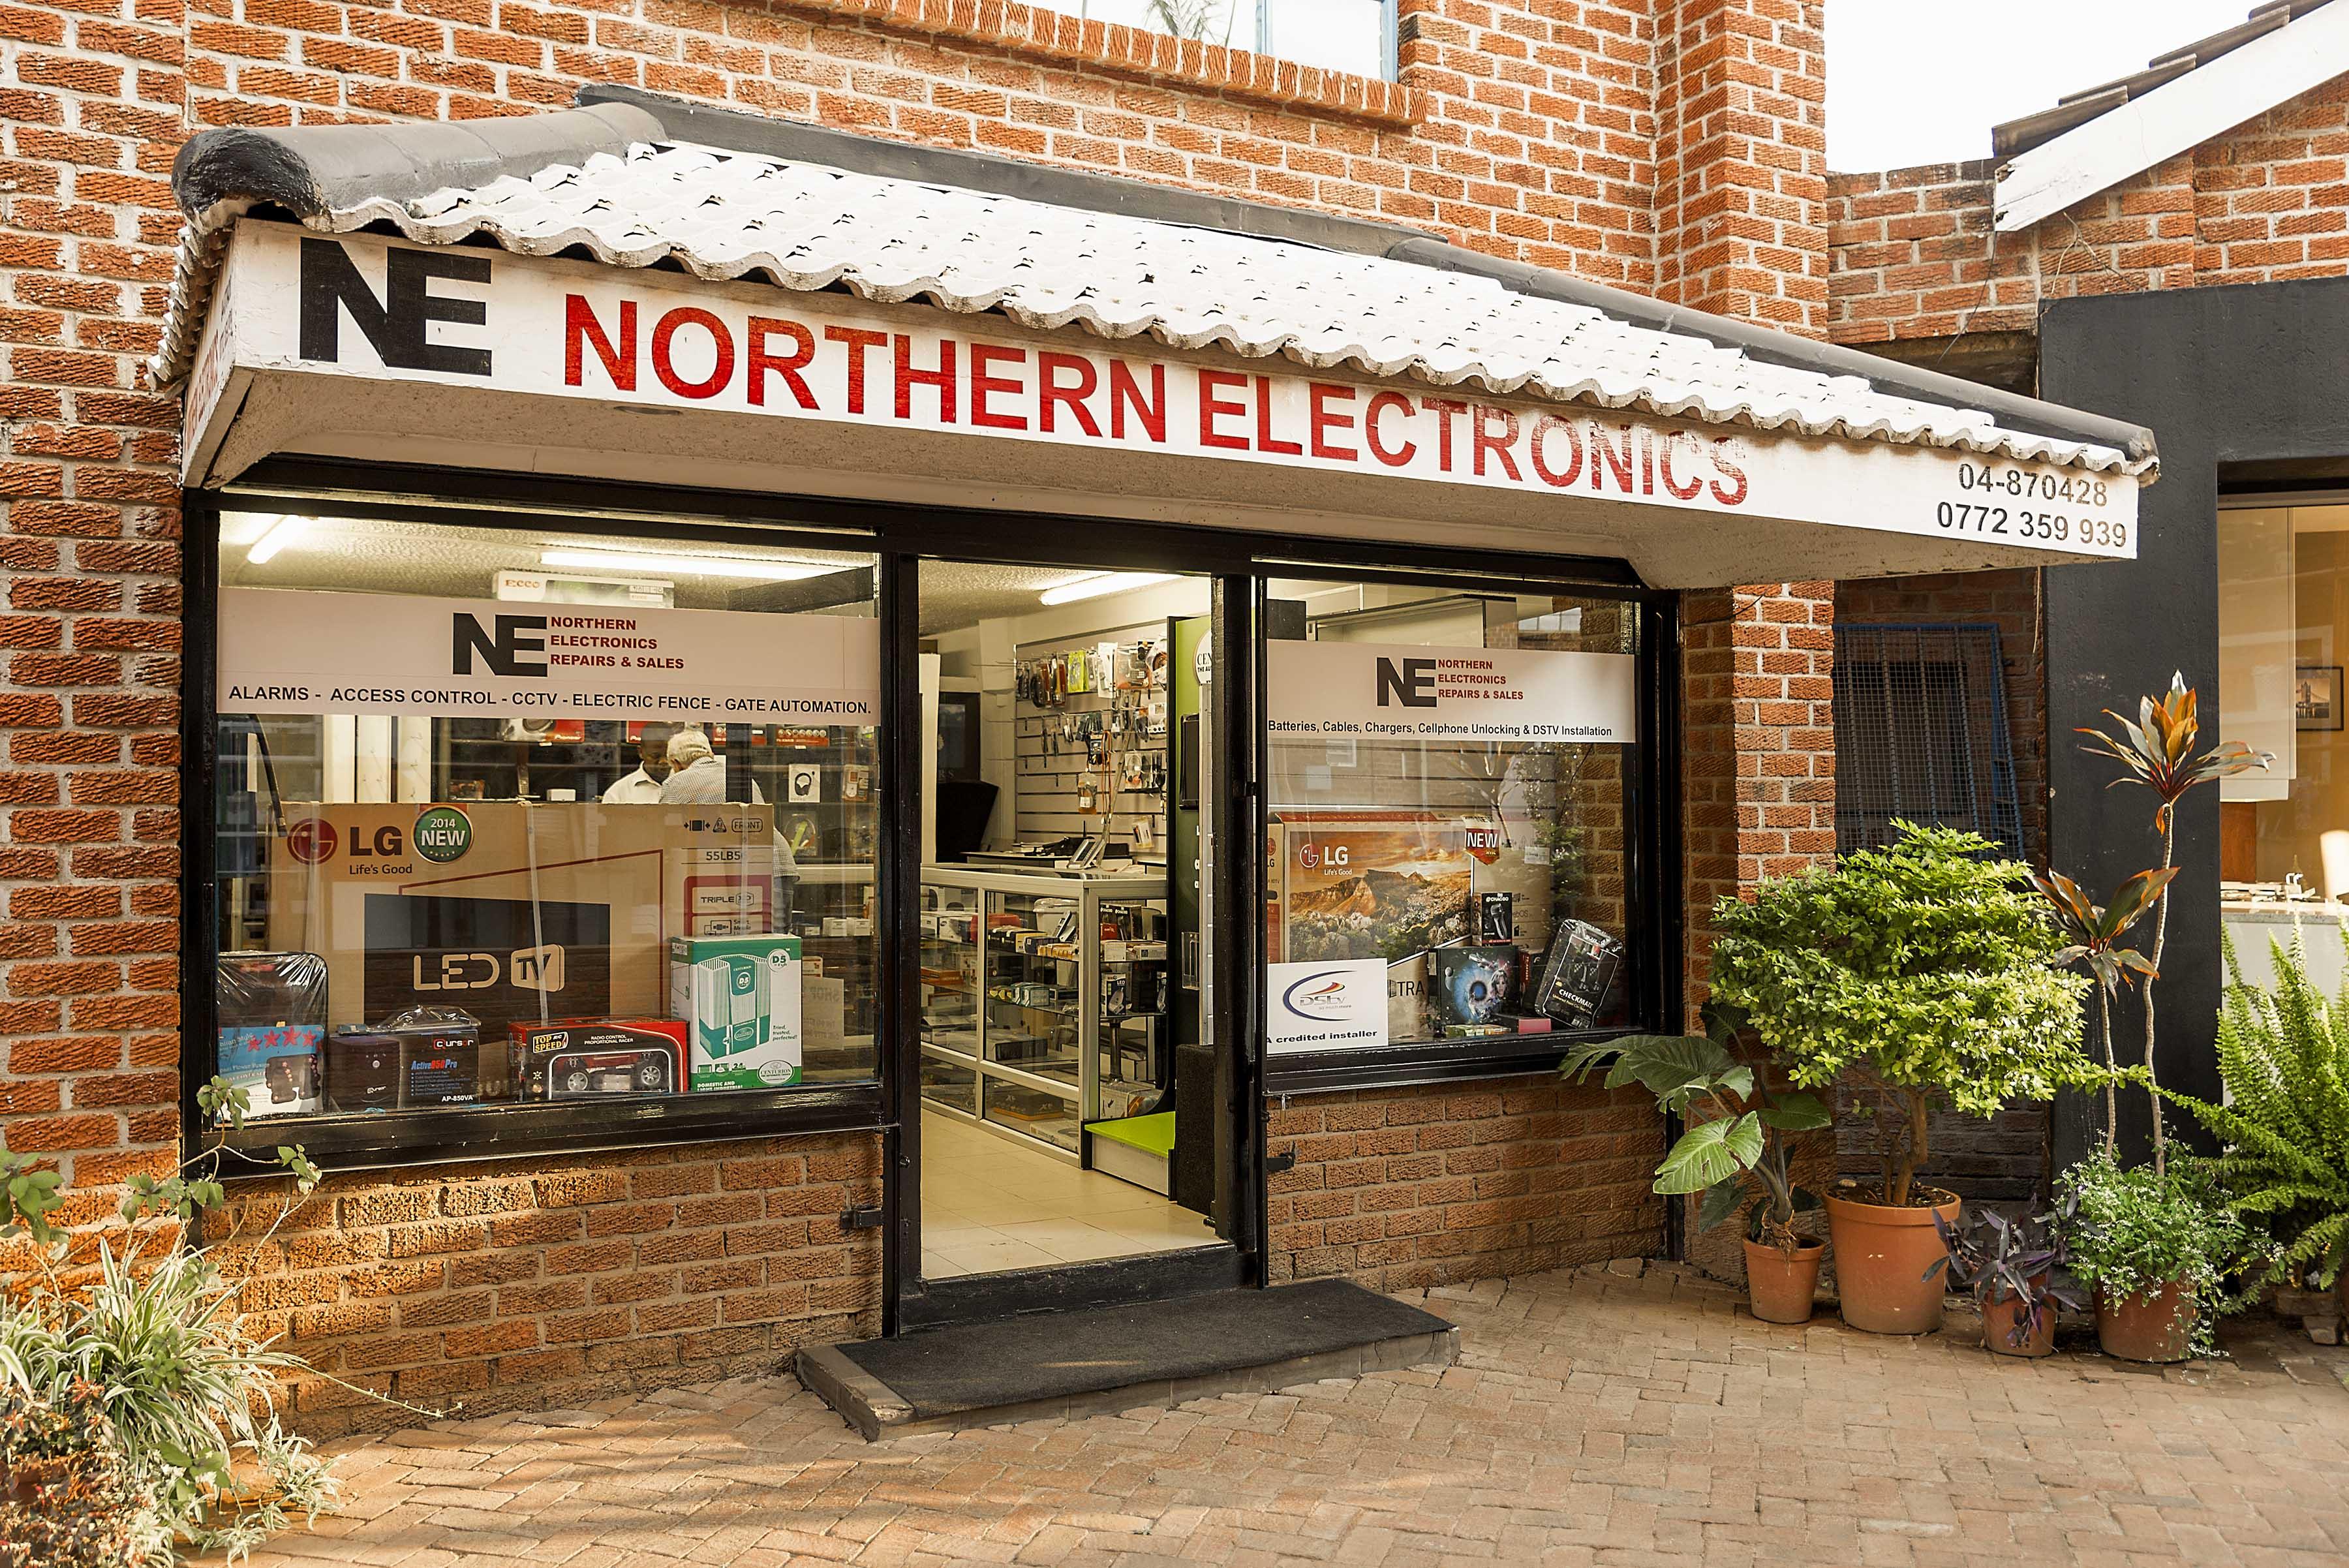 Northern Electronics